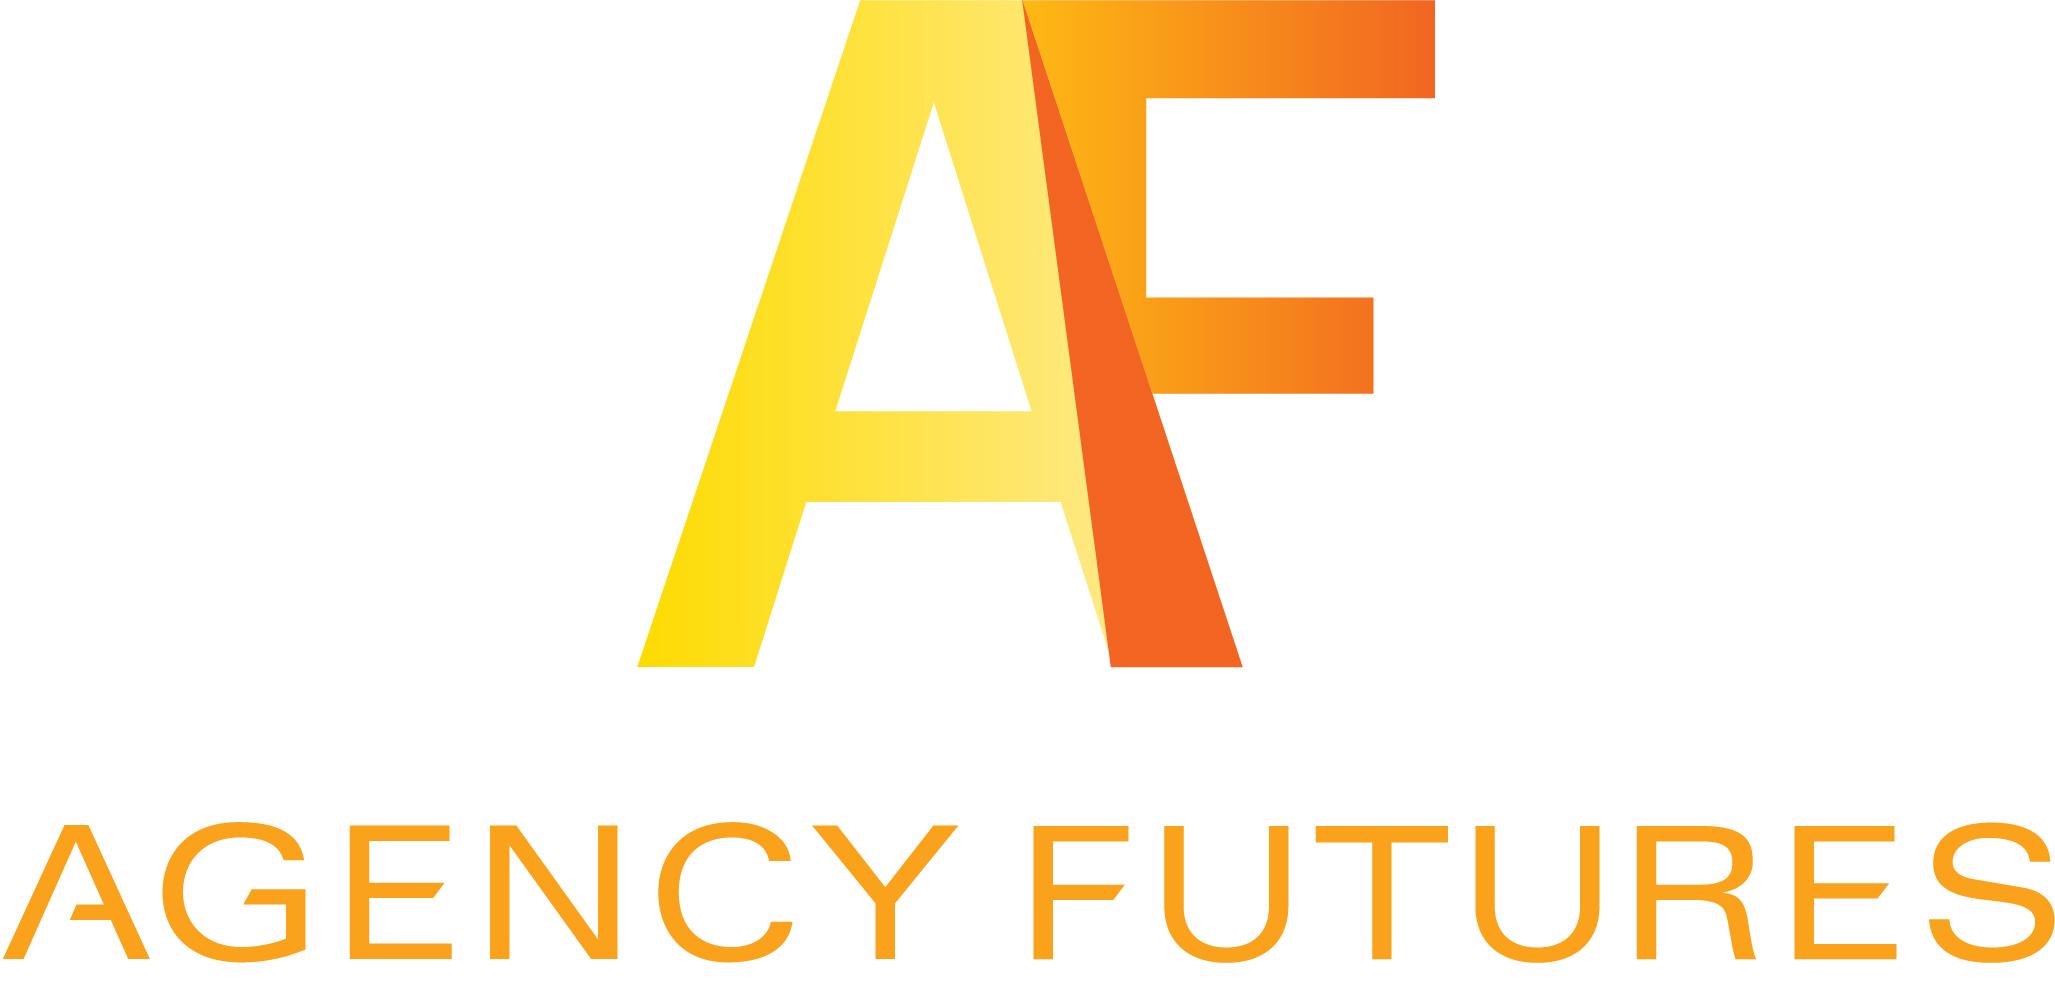 https://worldmeeting.worldwidepartners.com/wp-content/uploads/2019/09/AF_LogoColor.jpg